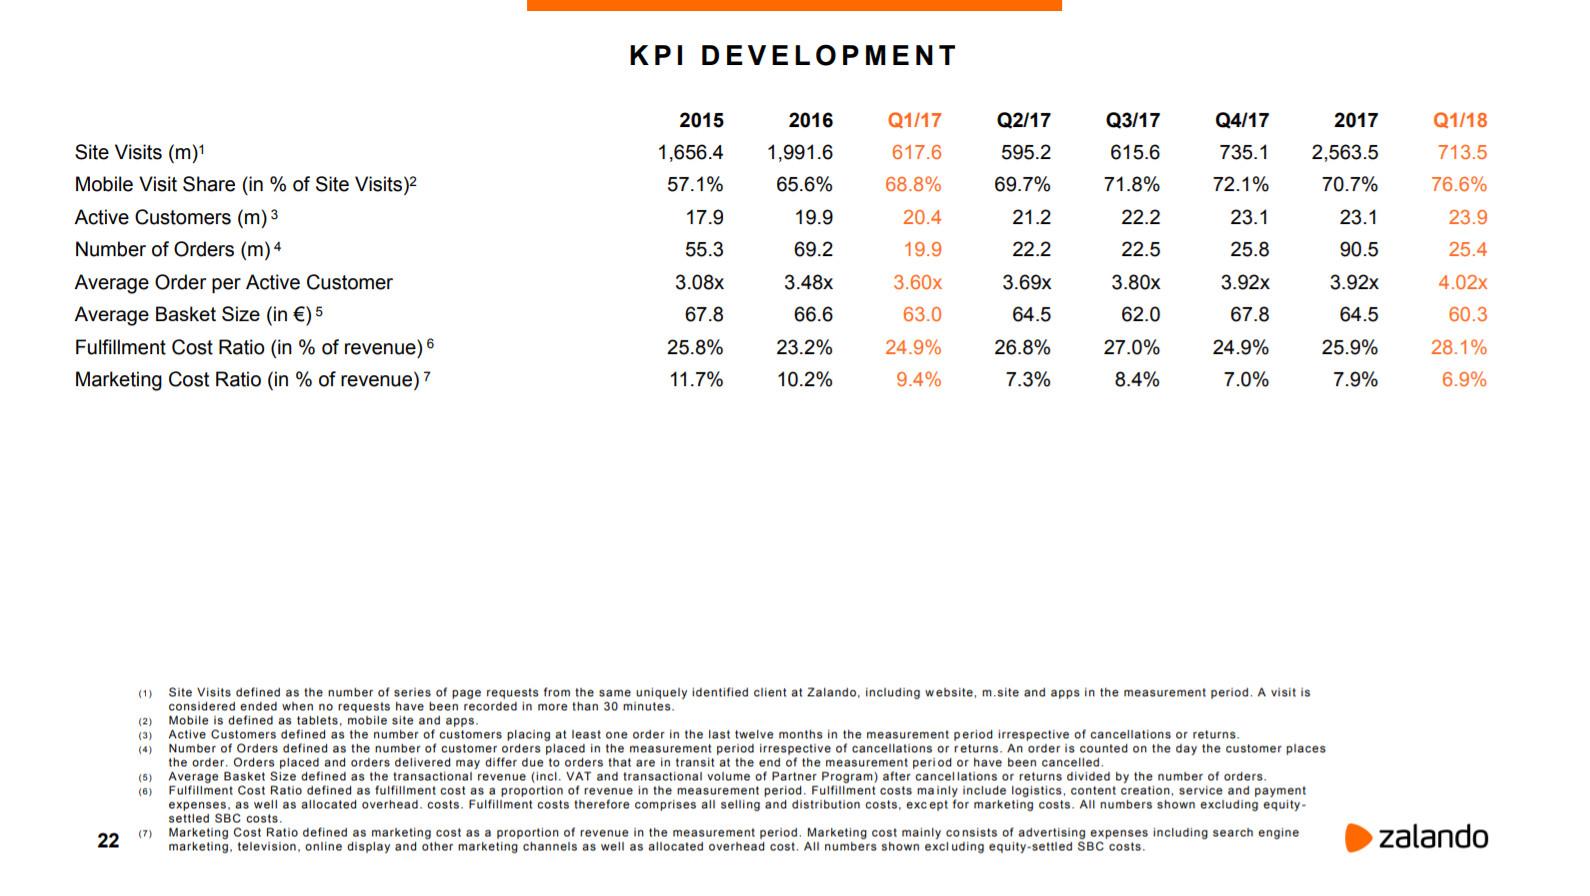 Entwicklung KPIs - Quelle: Zalando